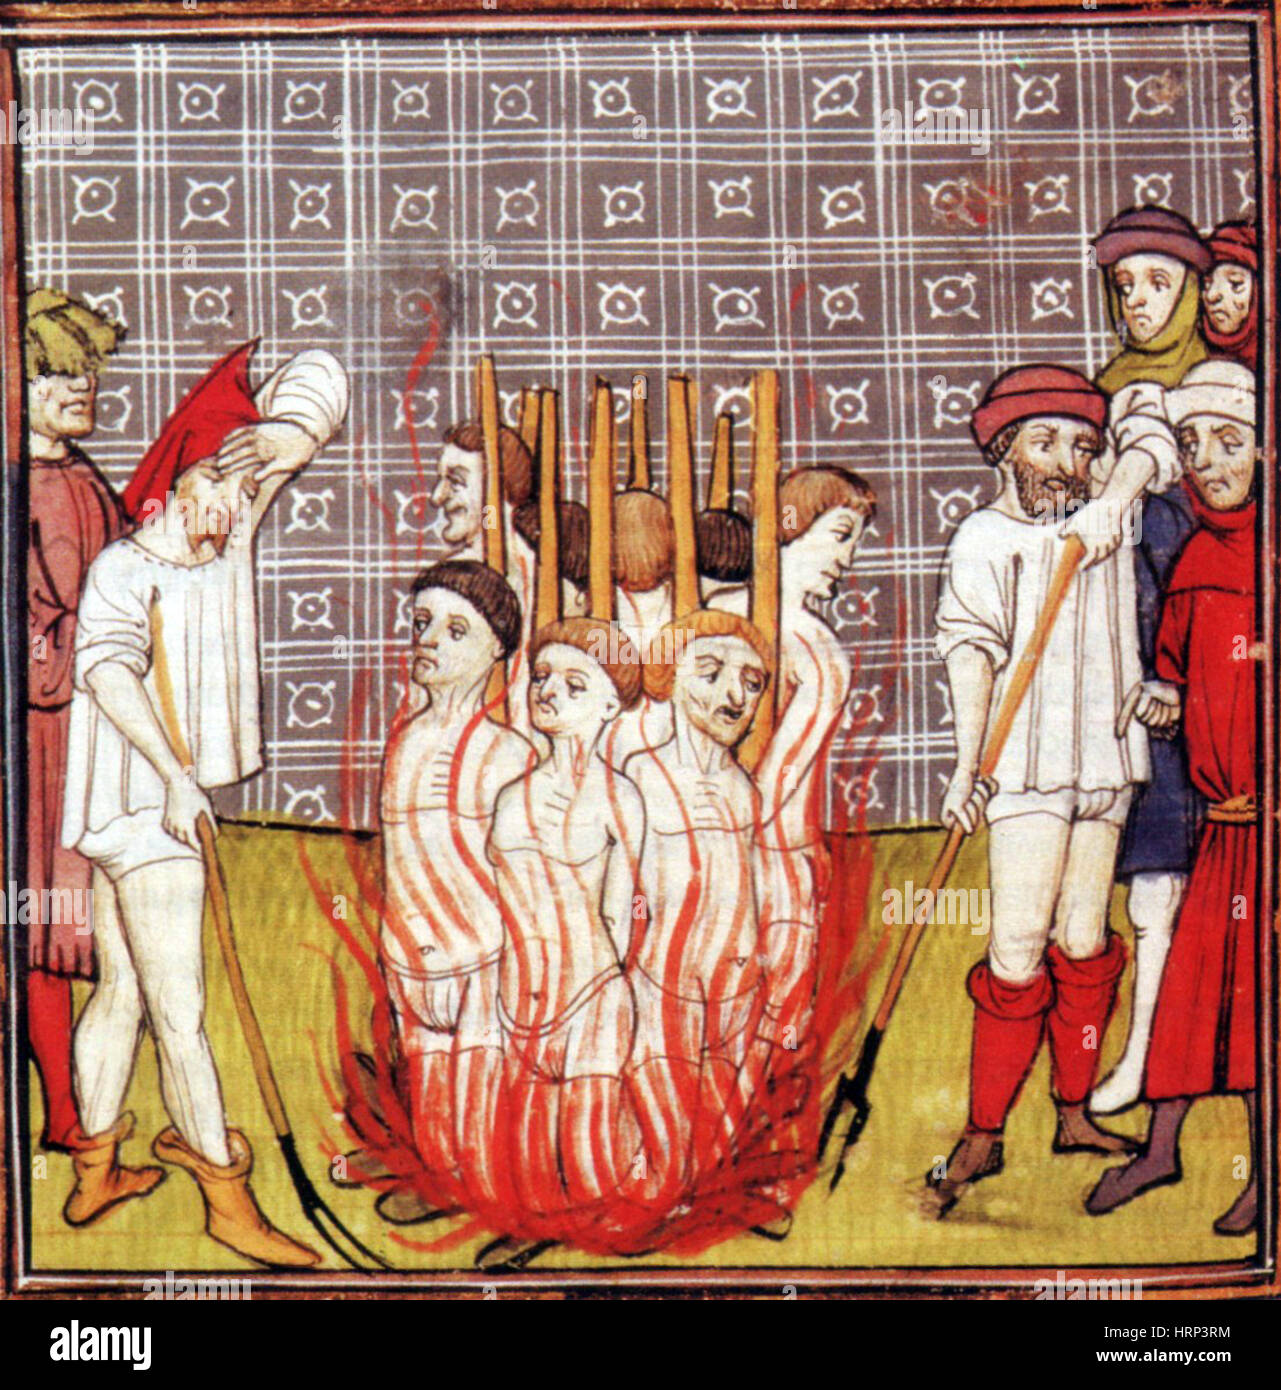 Knights Templar Burned At Stake, 1307 - Stock Image